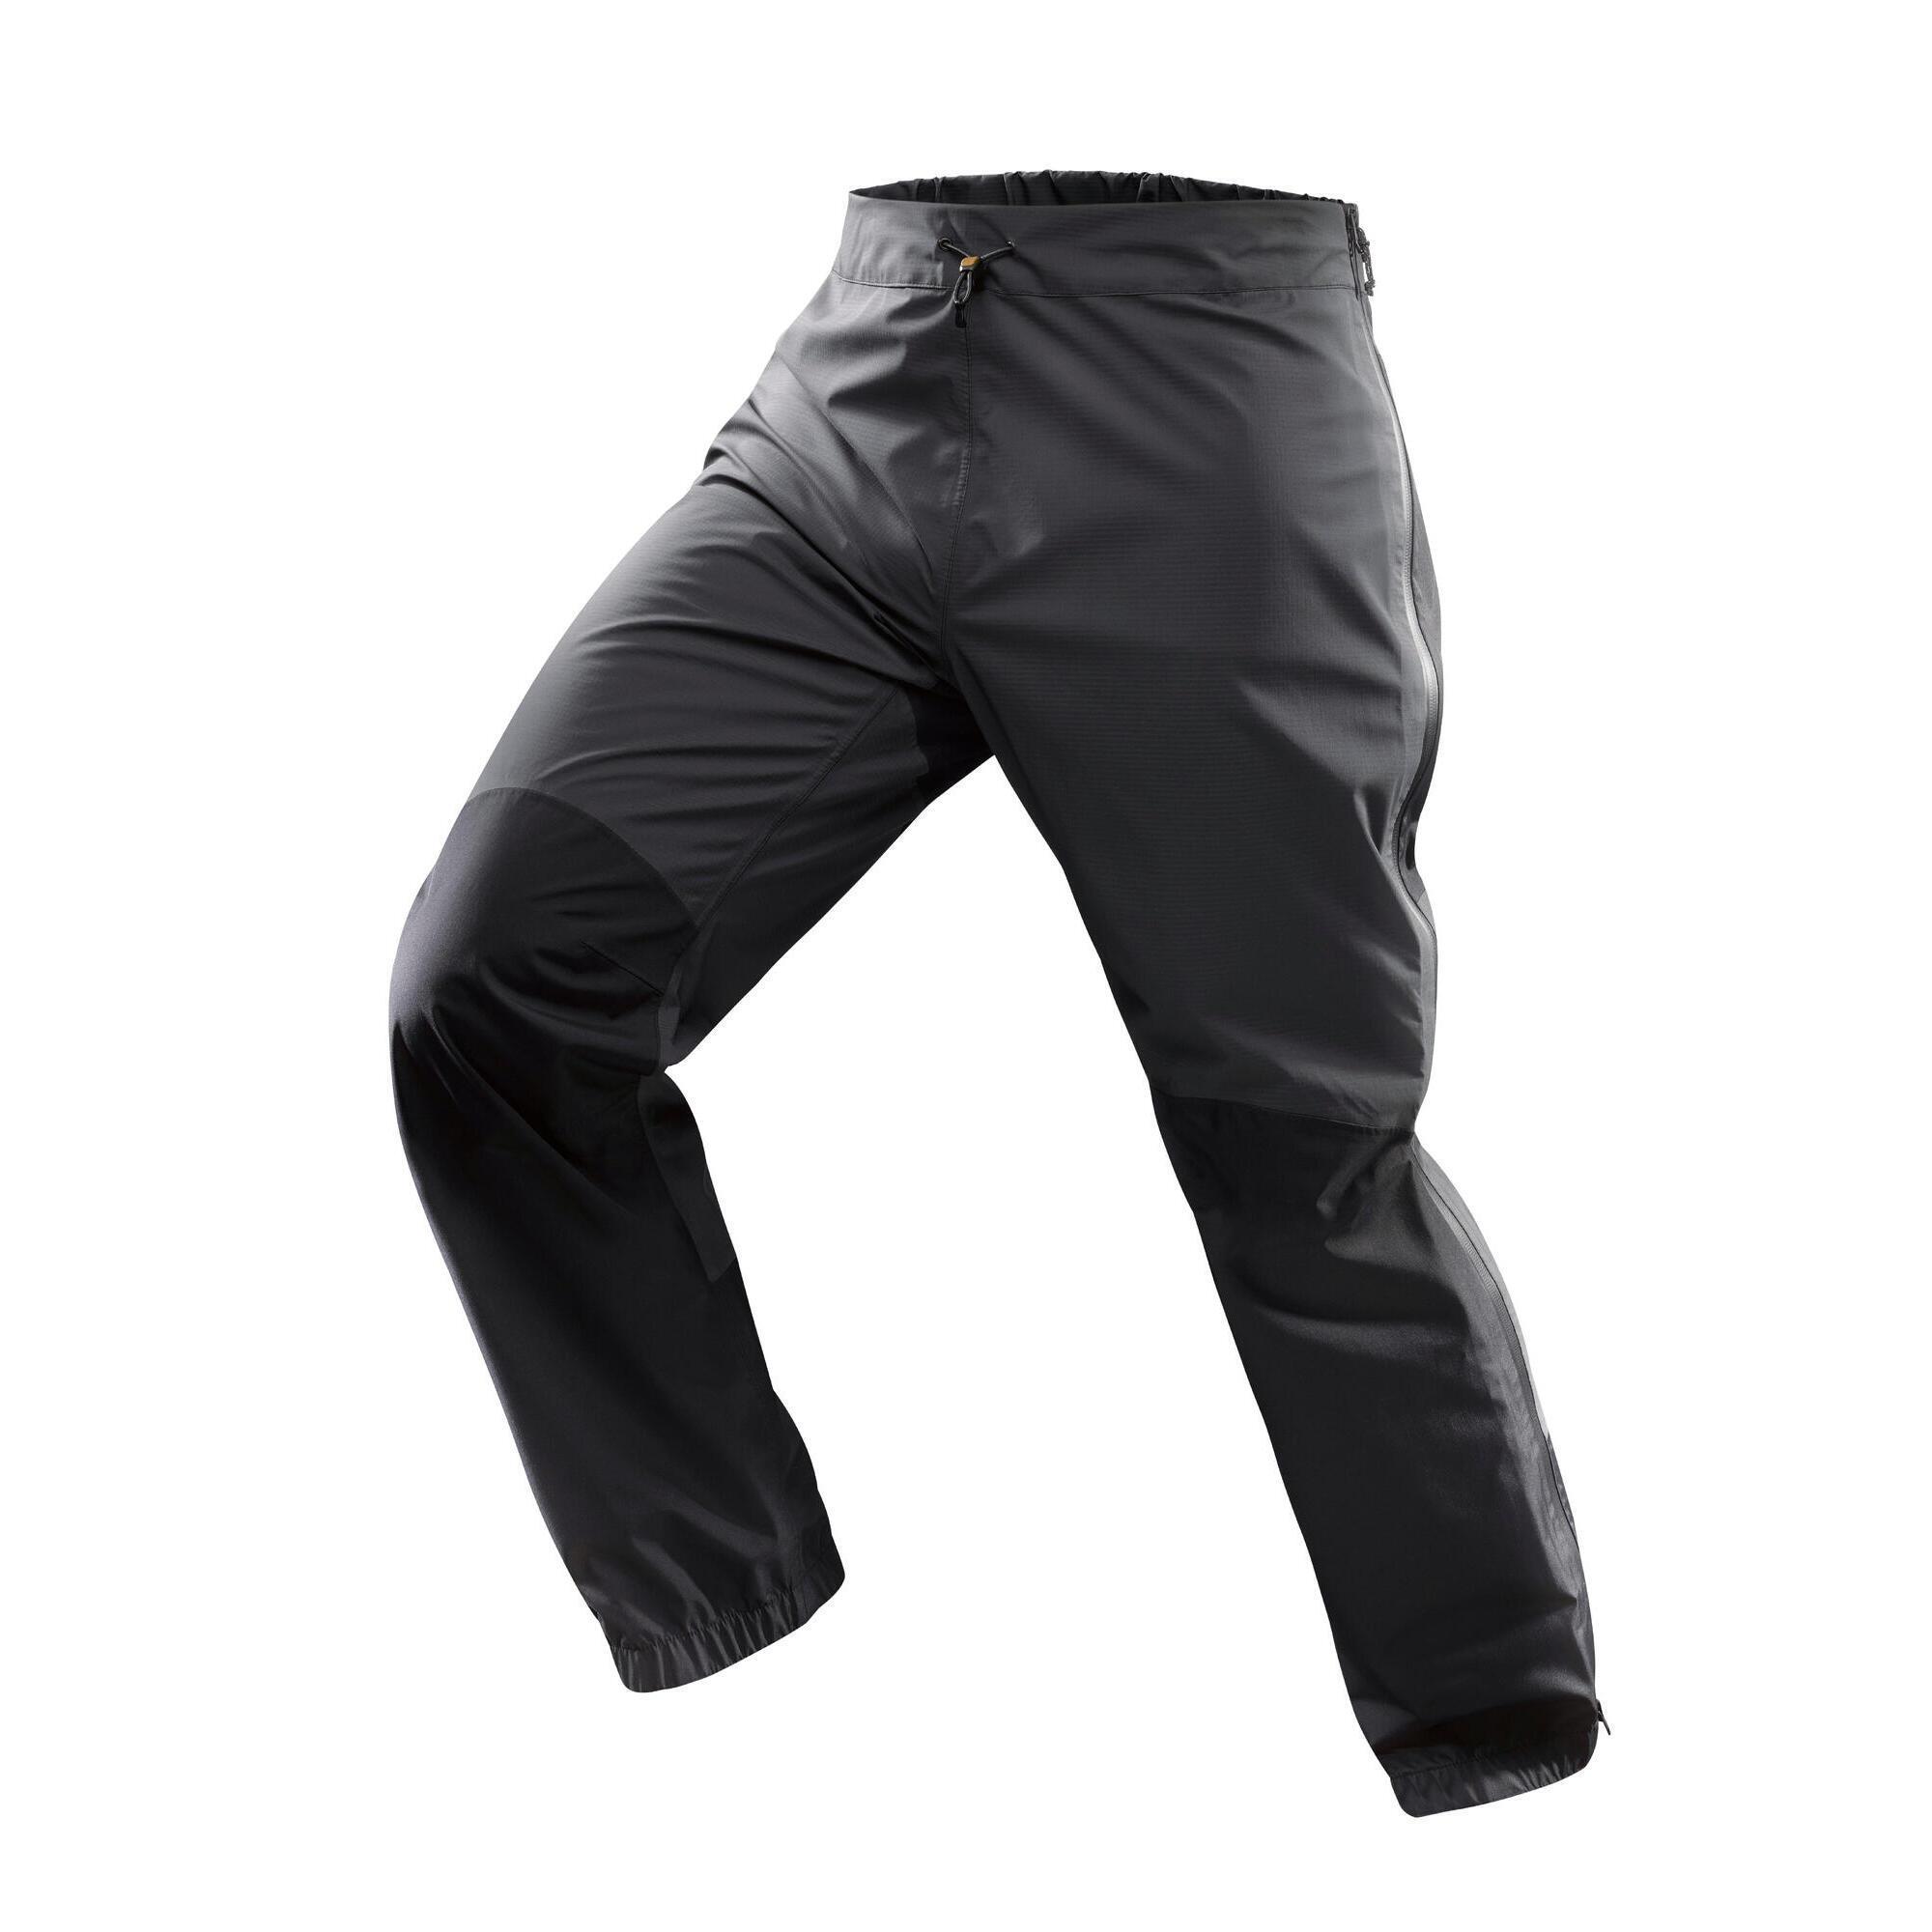 ac340a2e15 Hosen und Shorts bei Sportiply